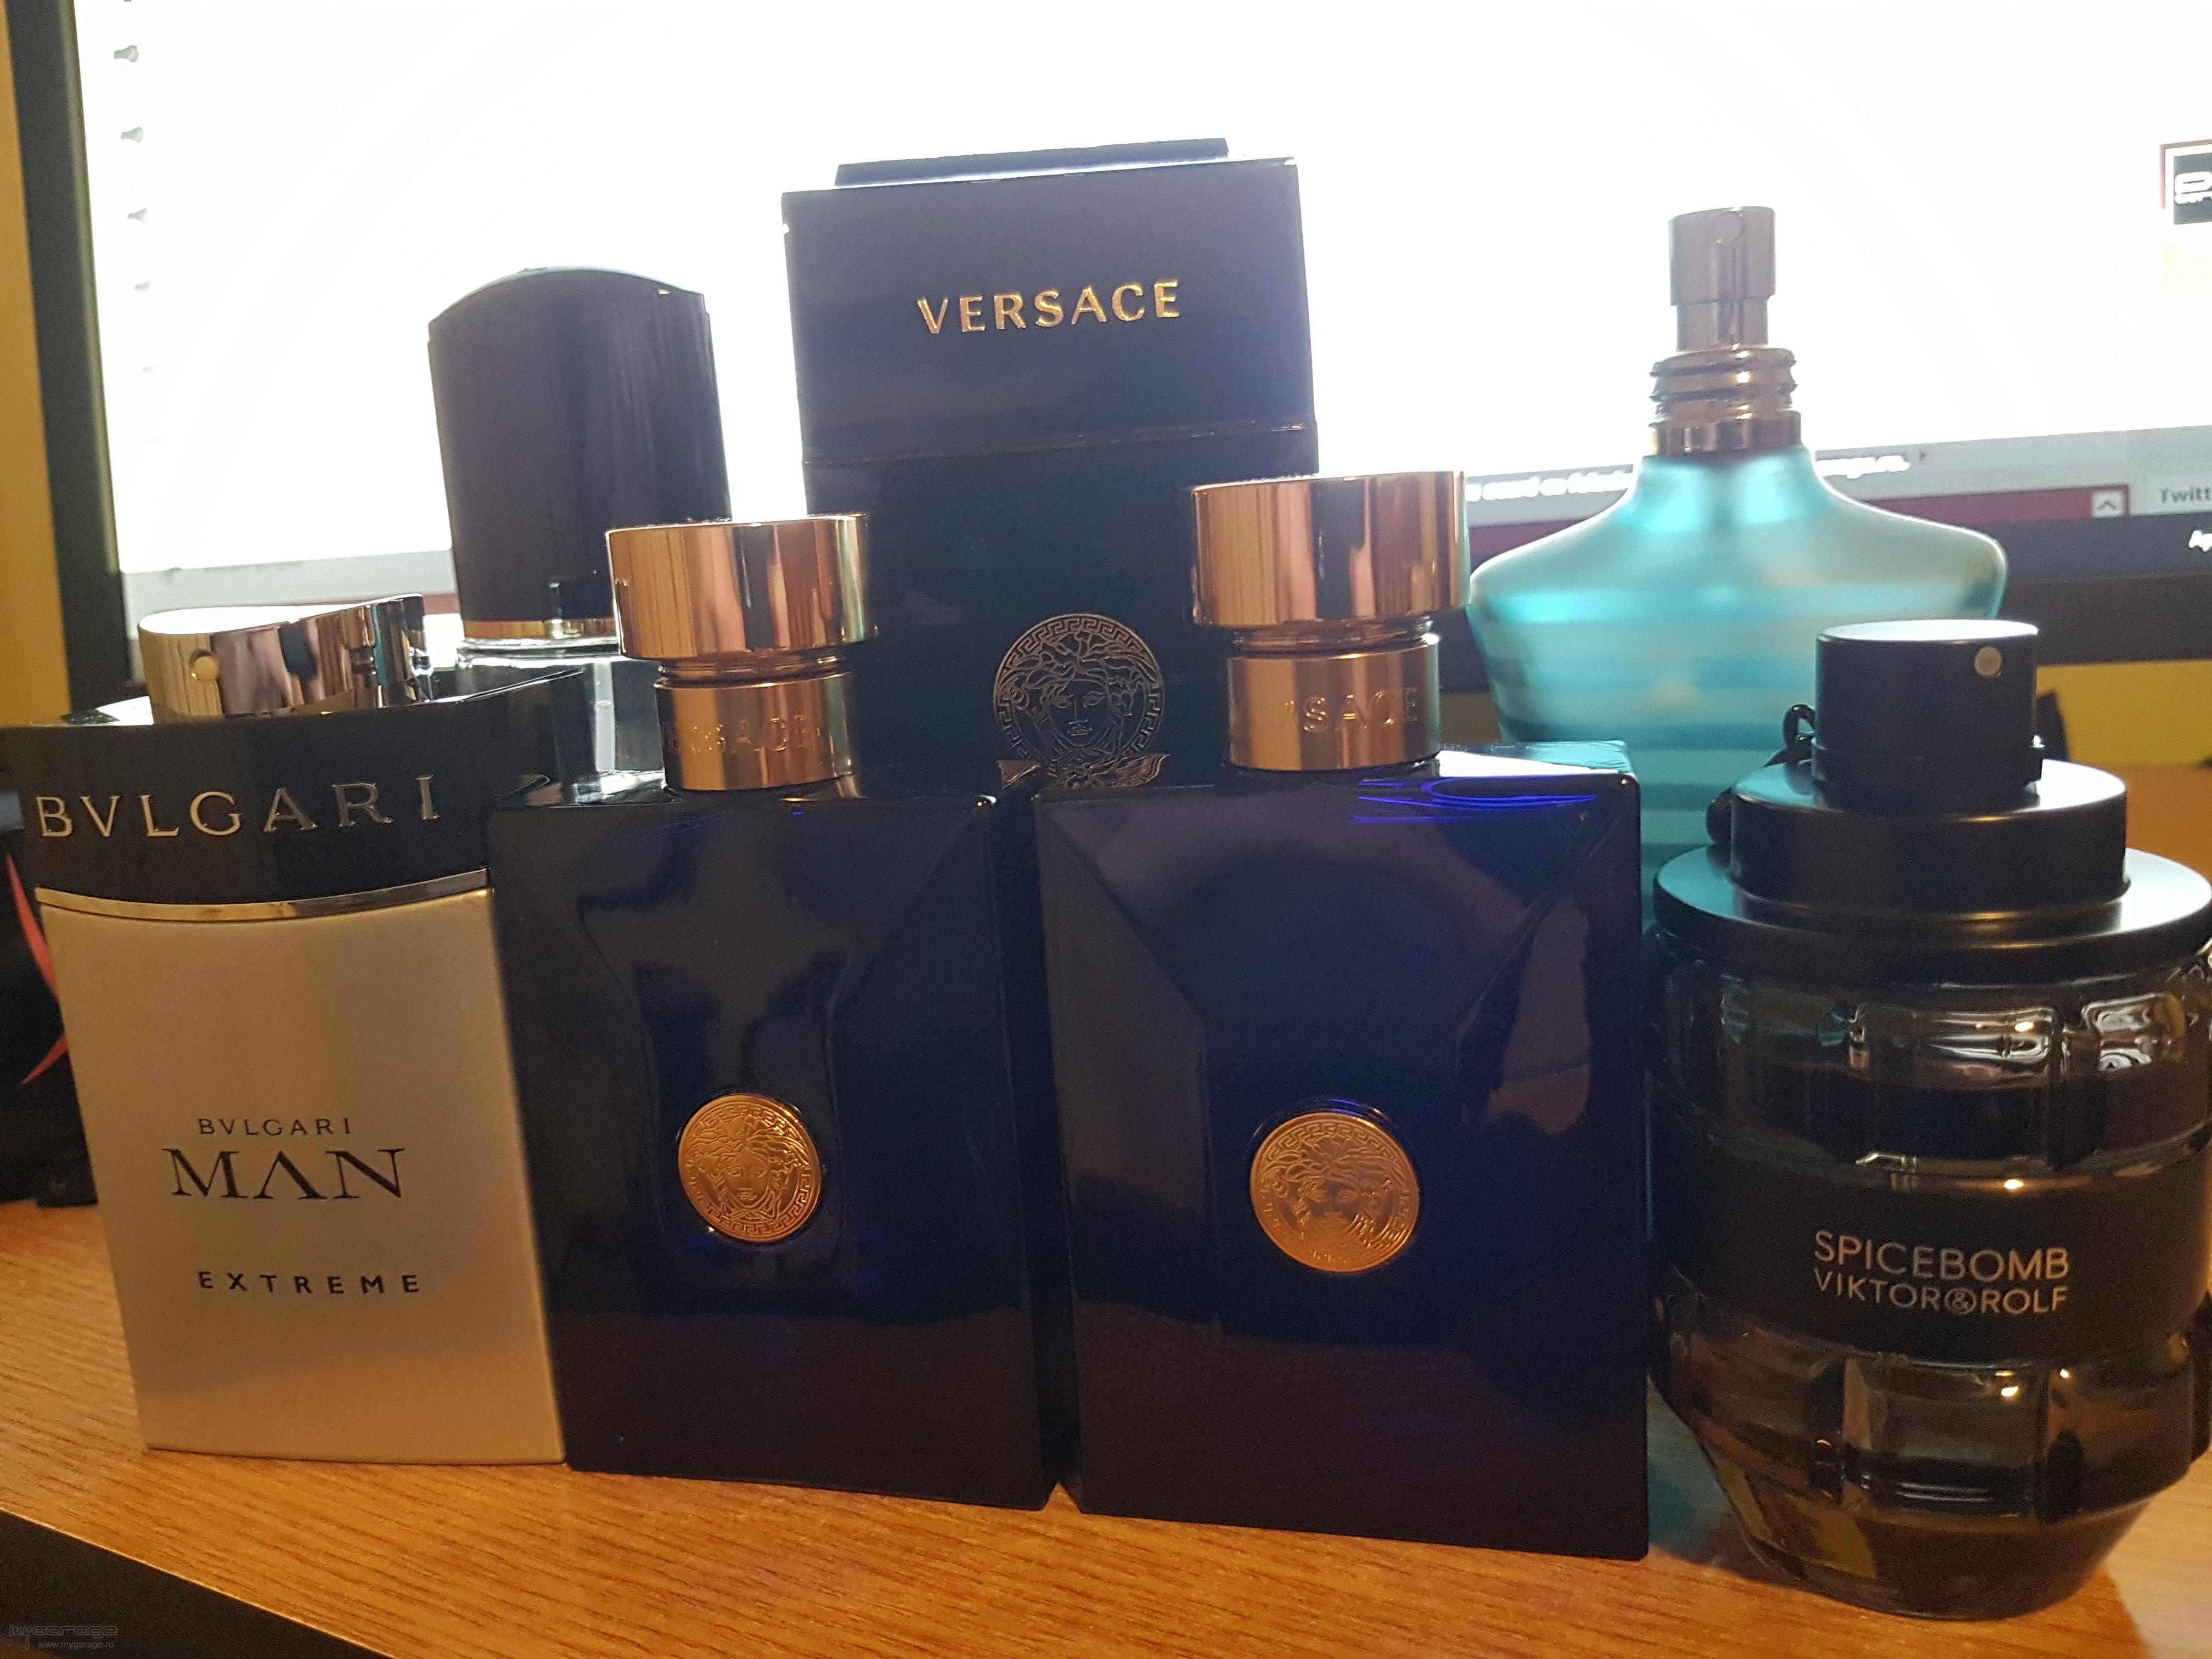 Ce Parfumparfumuri Aveti Si Ce Ati Vrea Sa Aveti Pagina 87